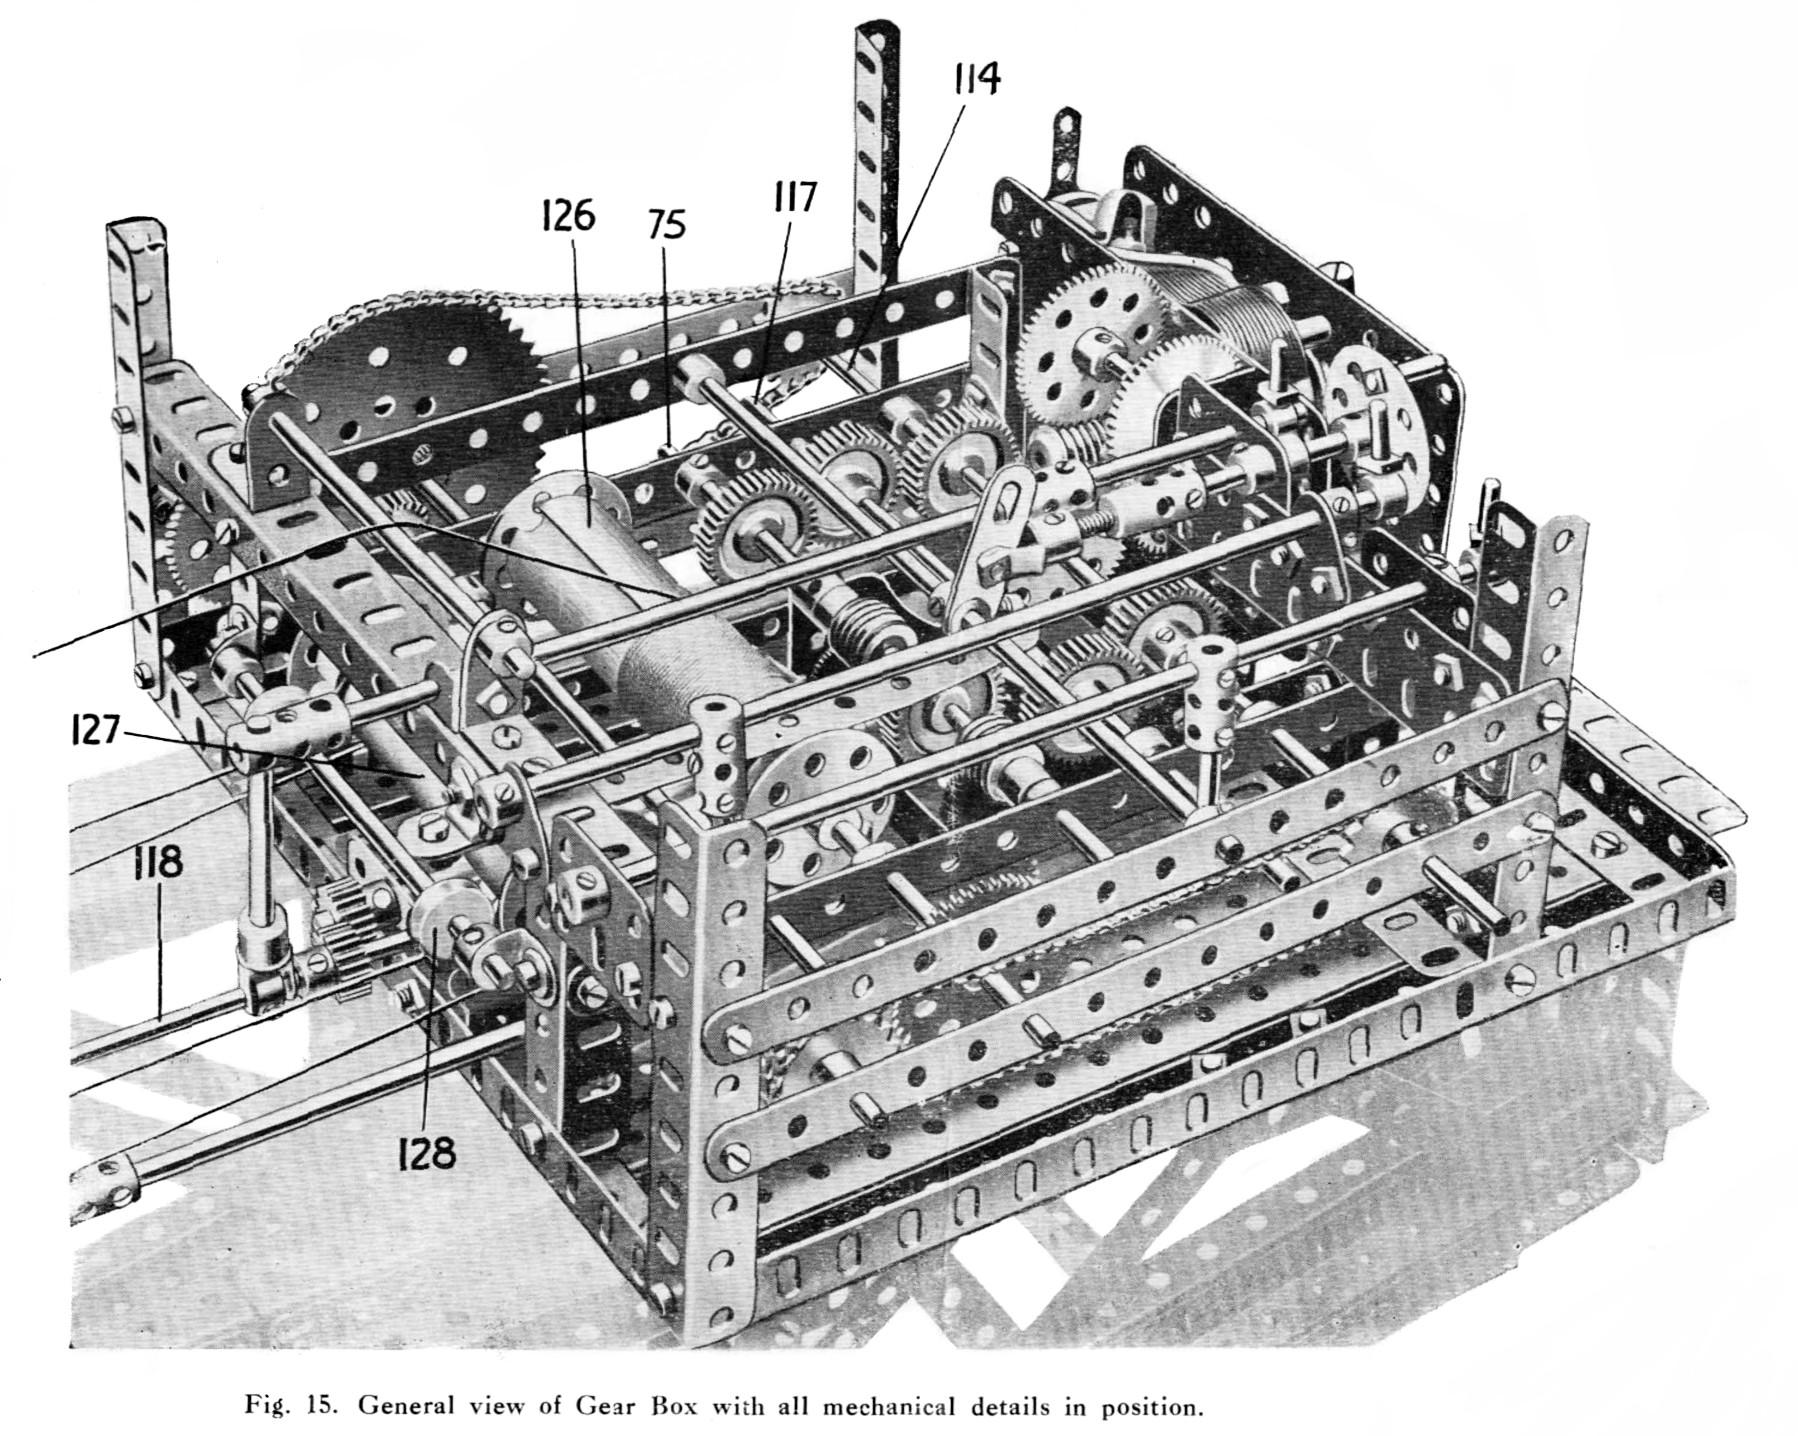 Meccano Giant Block-Setting Crane (Meccano Super Models No 4) - The Brighton Toy and Model Index